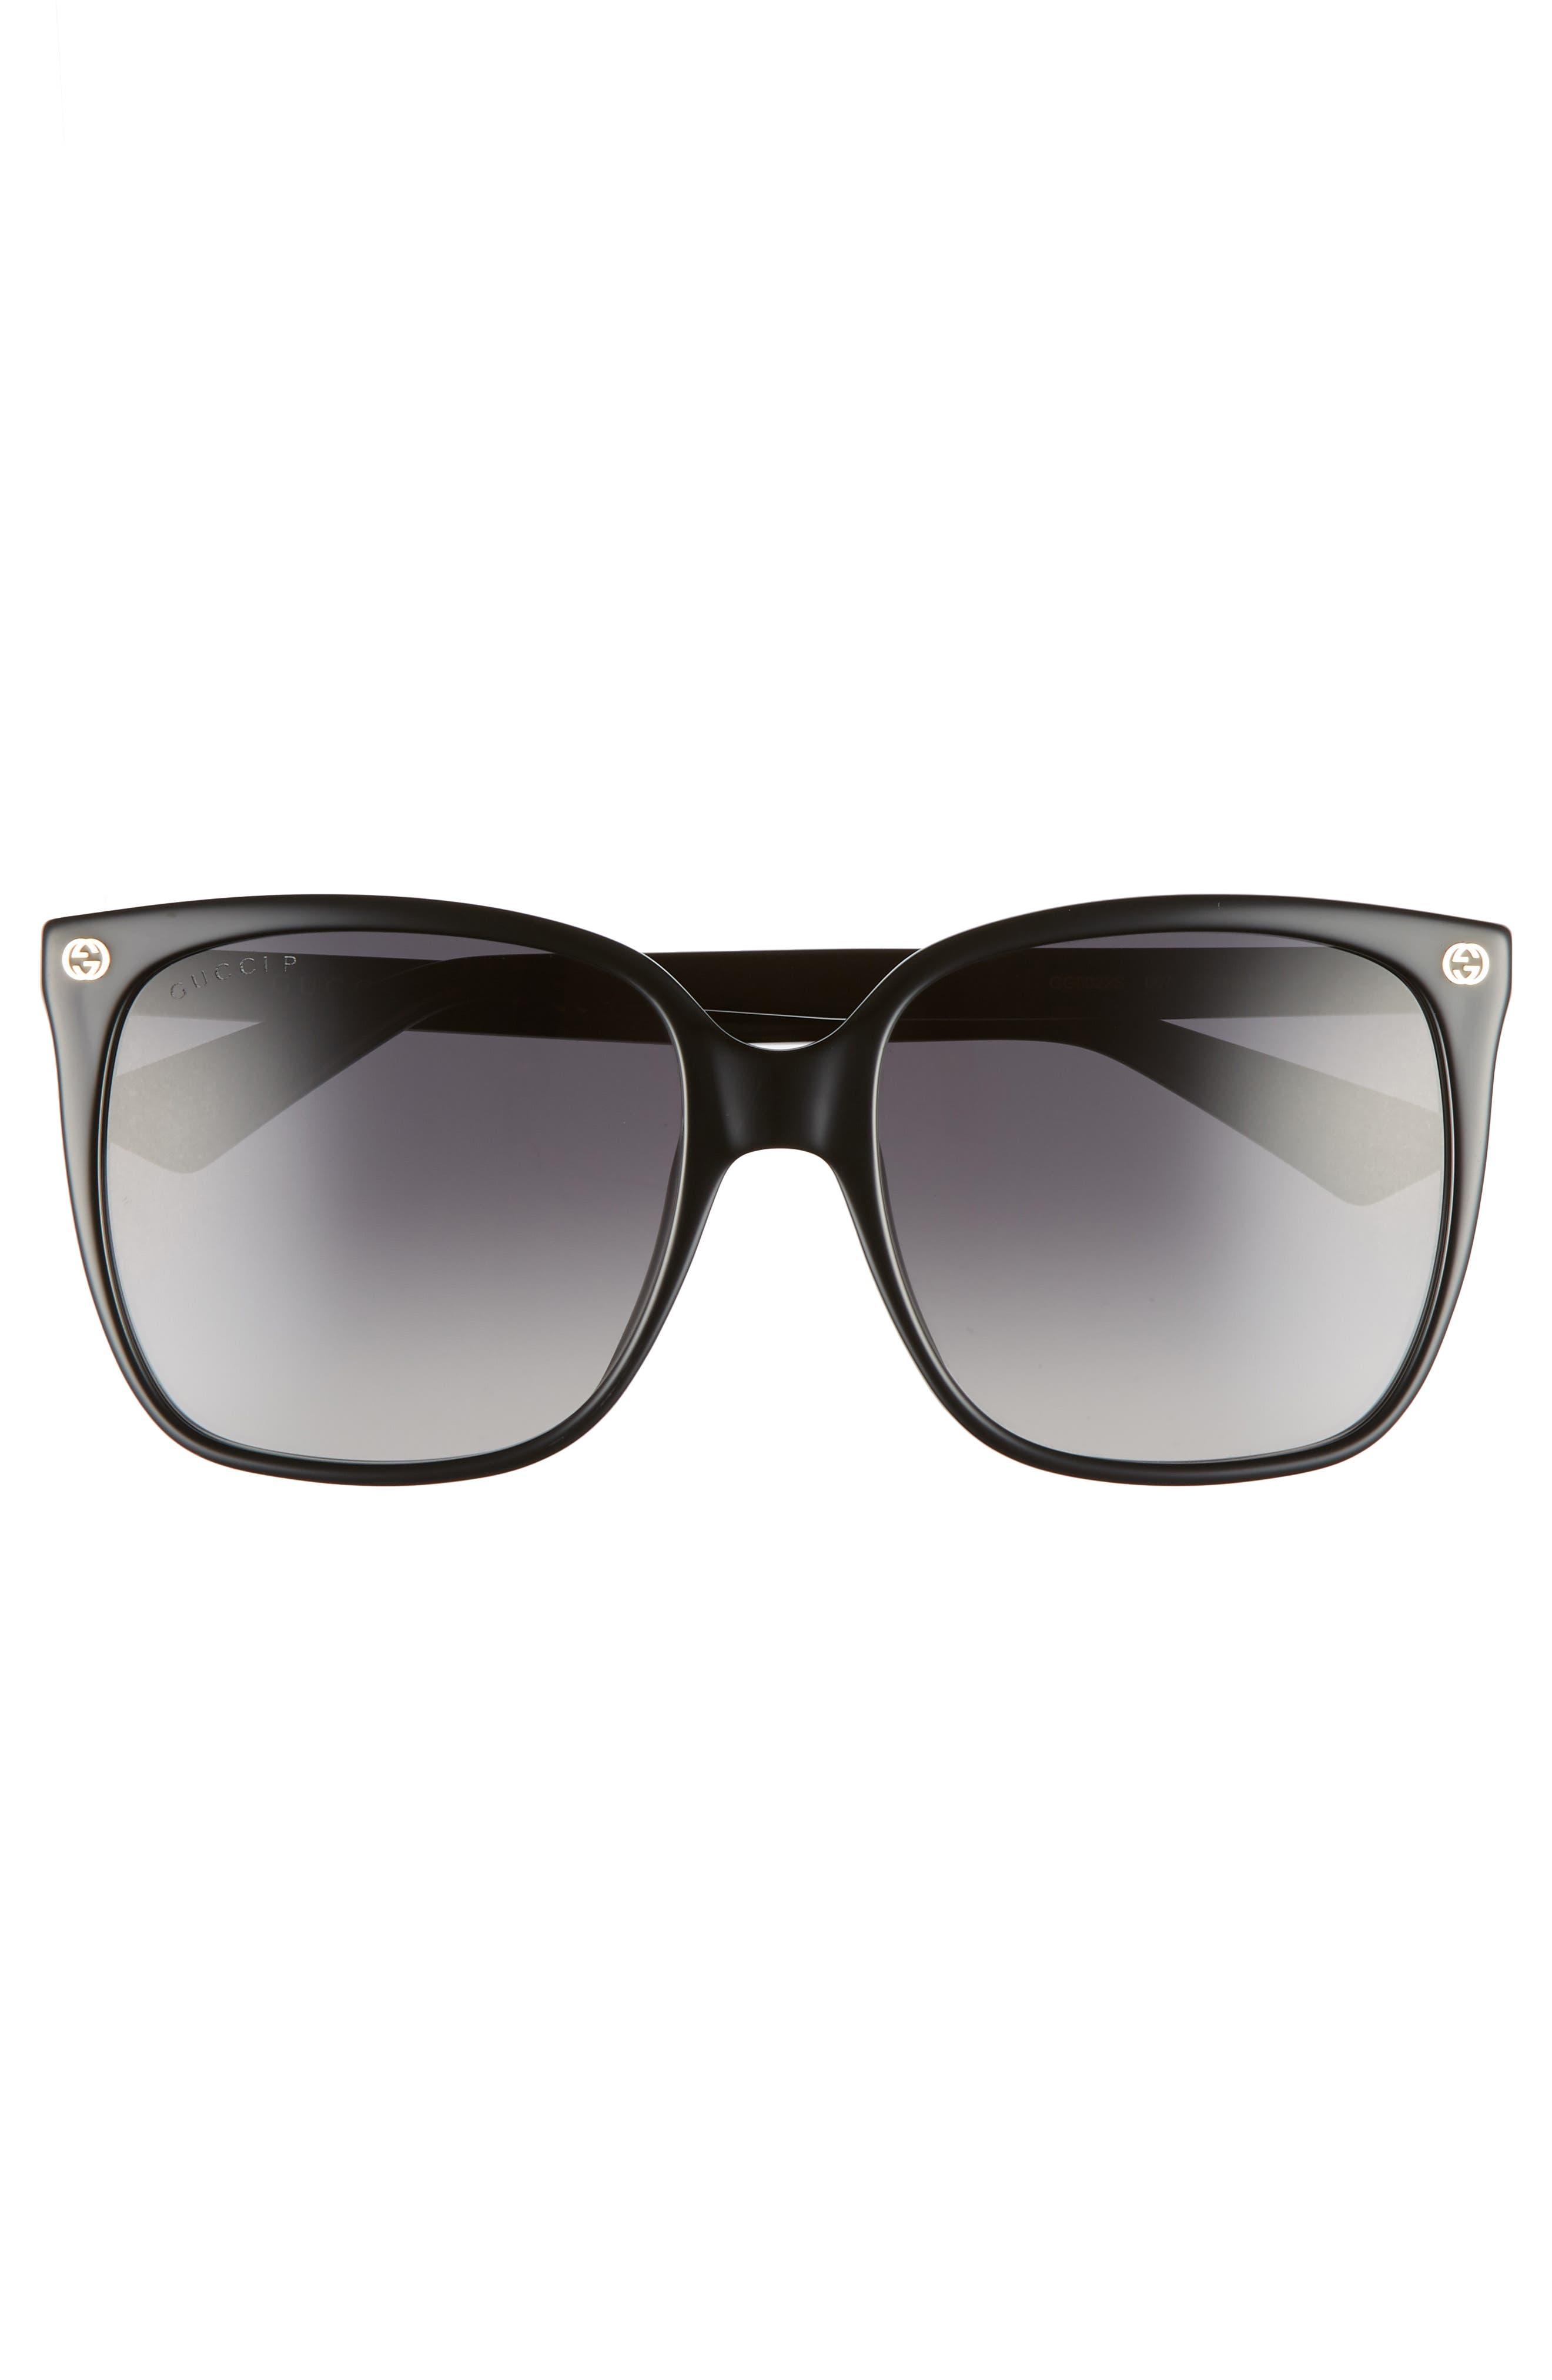 57mm Square Sunglasses,                             Alternate thumbnail 3, color,                             007